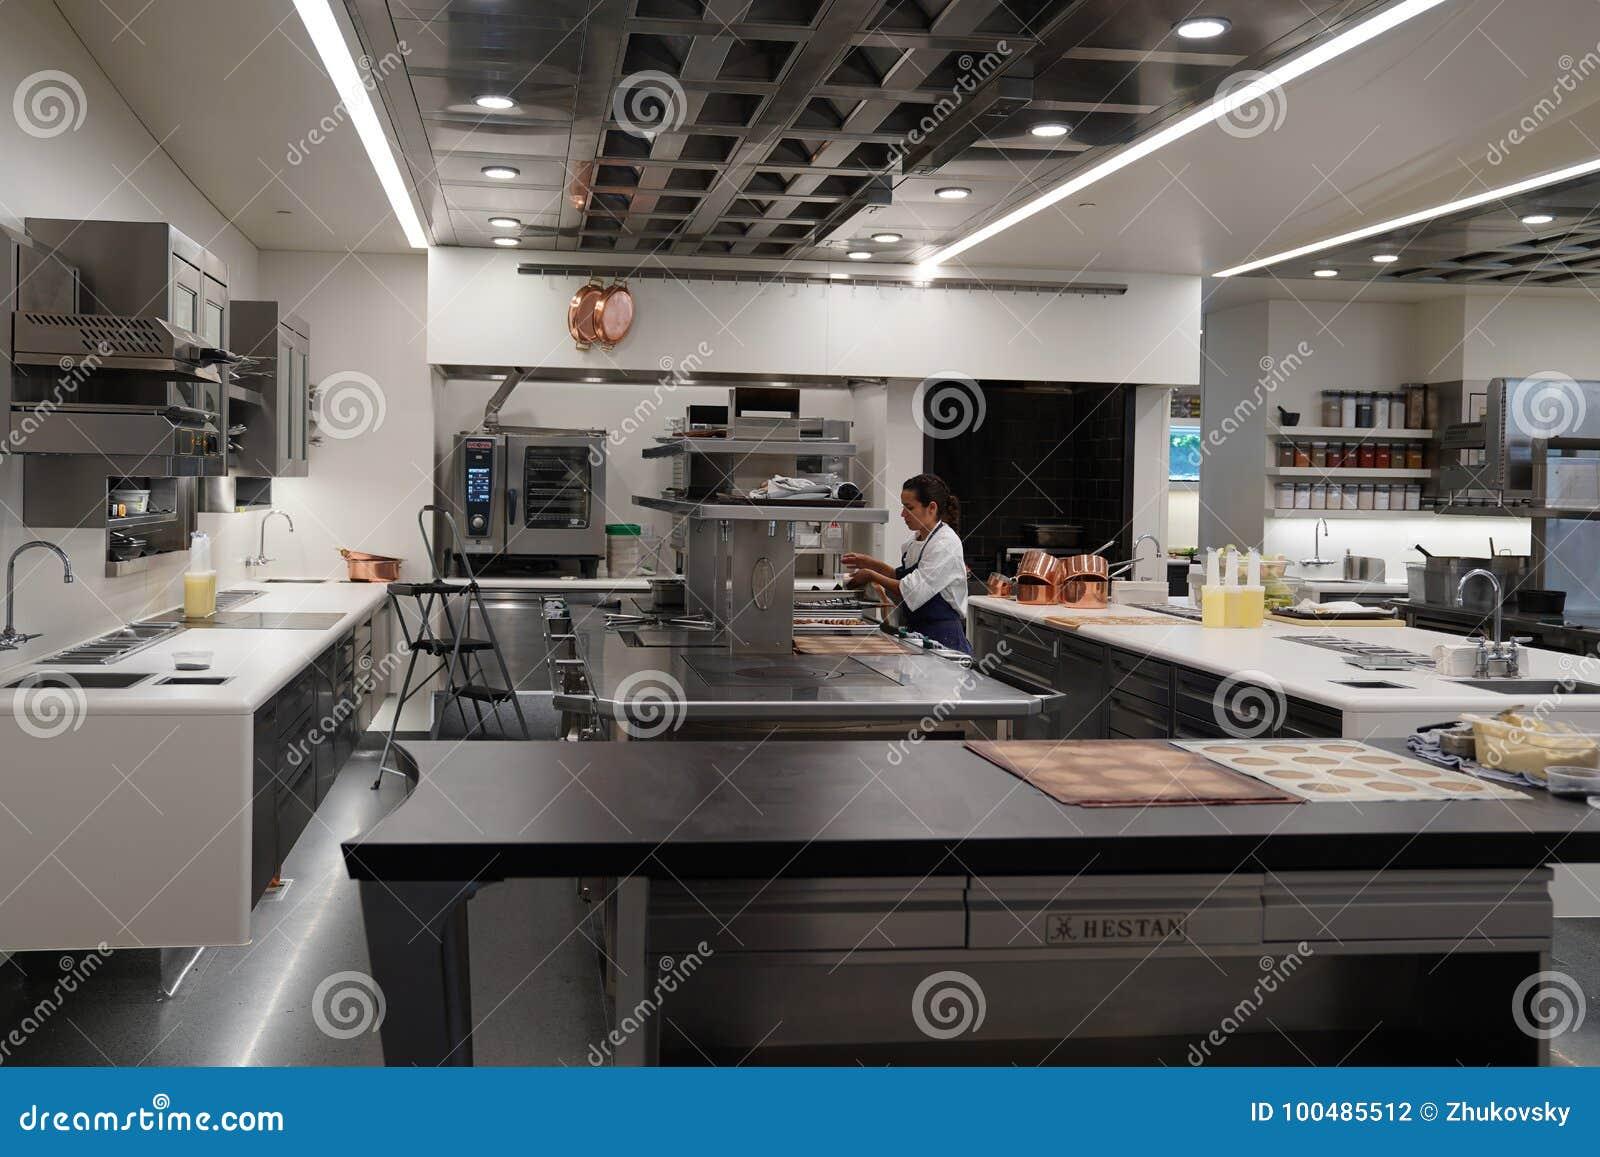 Napa Kitchen Menu